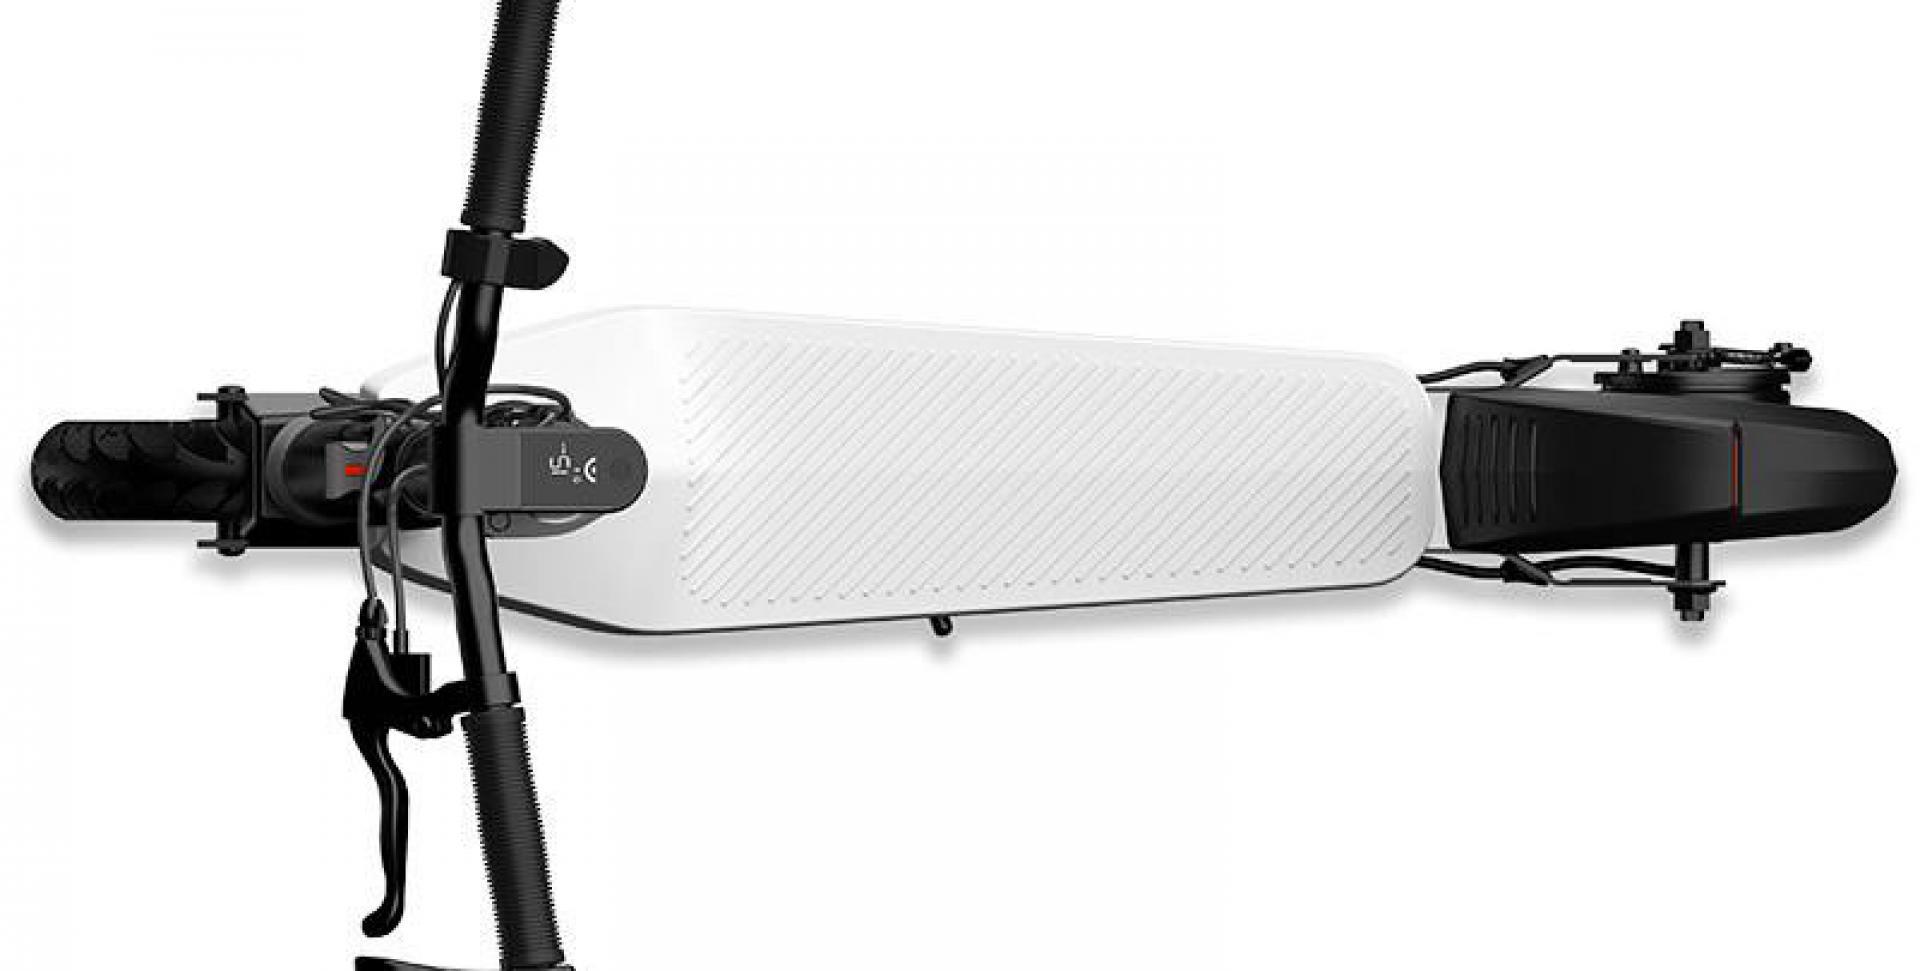 Okai-ES50-Electric-Kids-Scooter-Black-White-Top-View_2048x.jpg